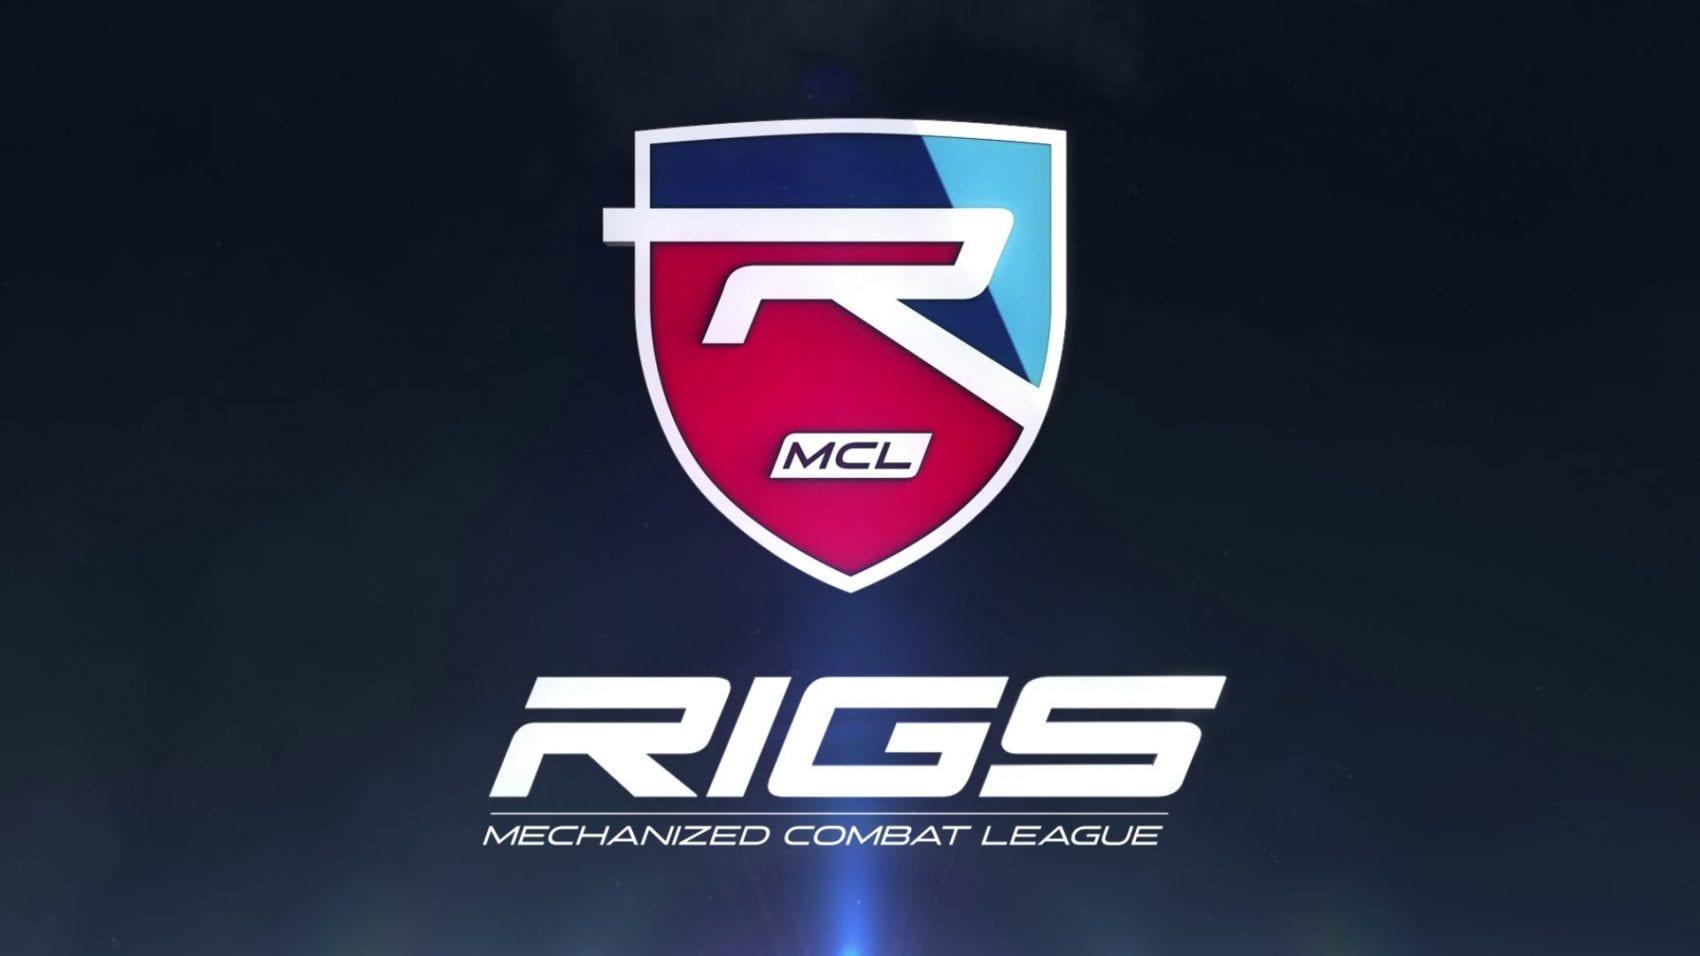 rigs-mechanized-combat-league-vr-test-my-geek-actu-logo